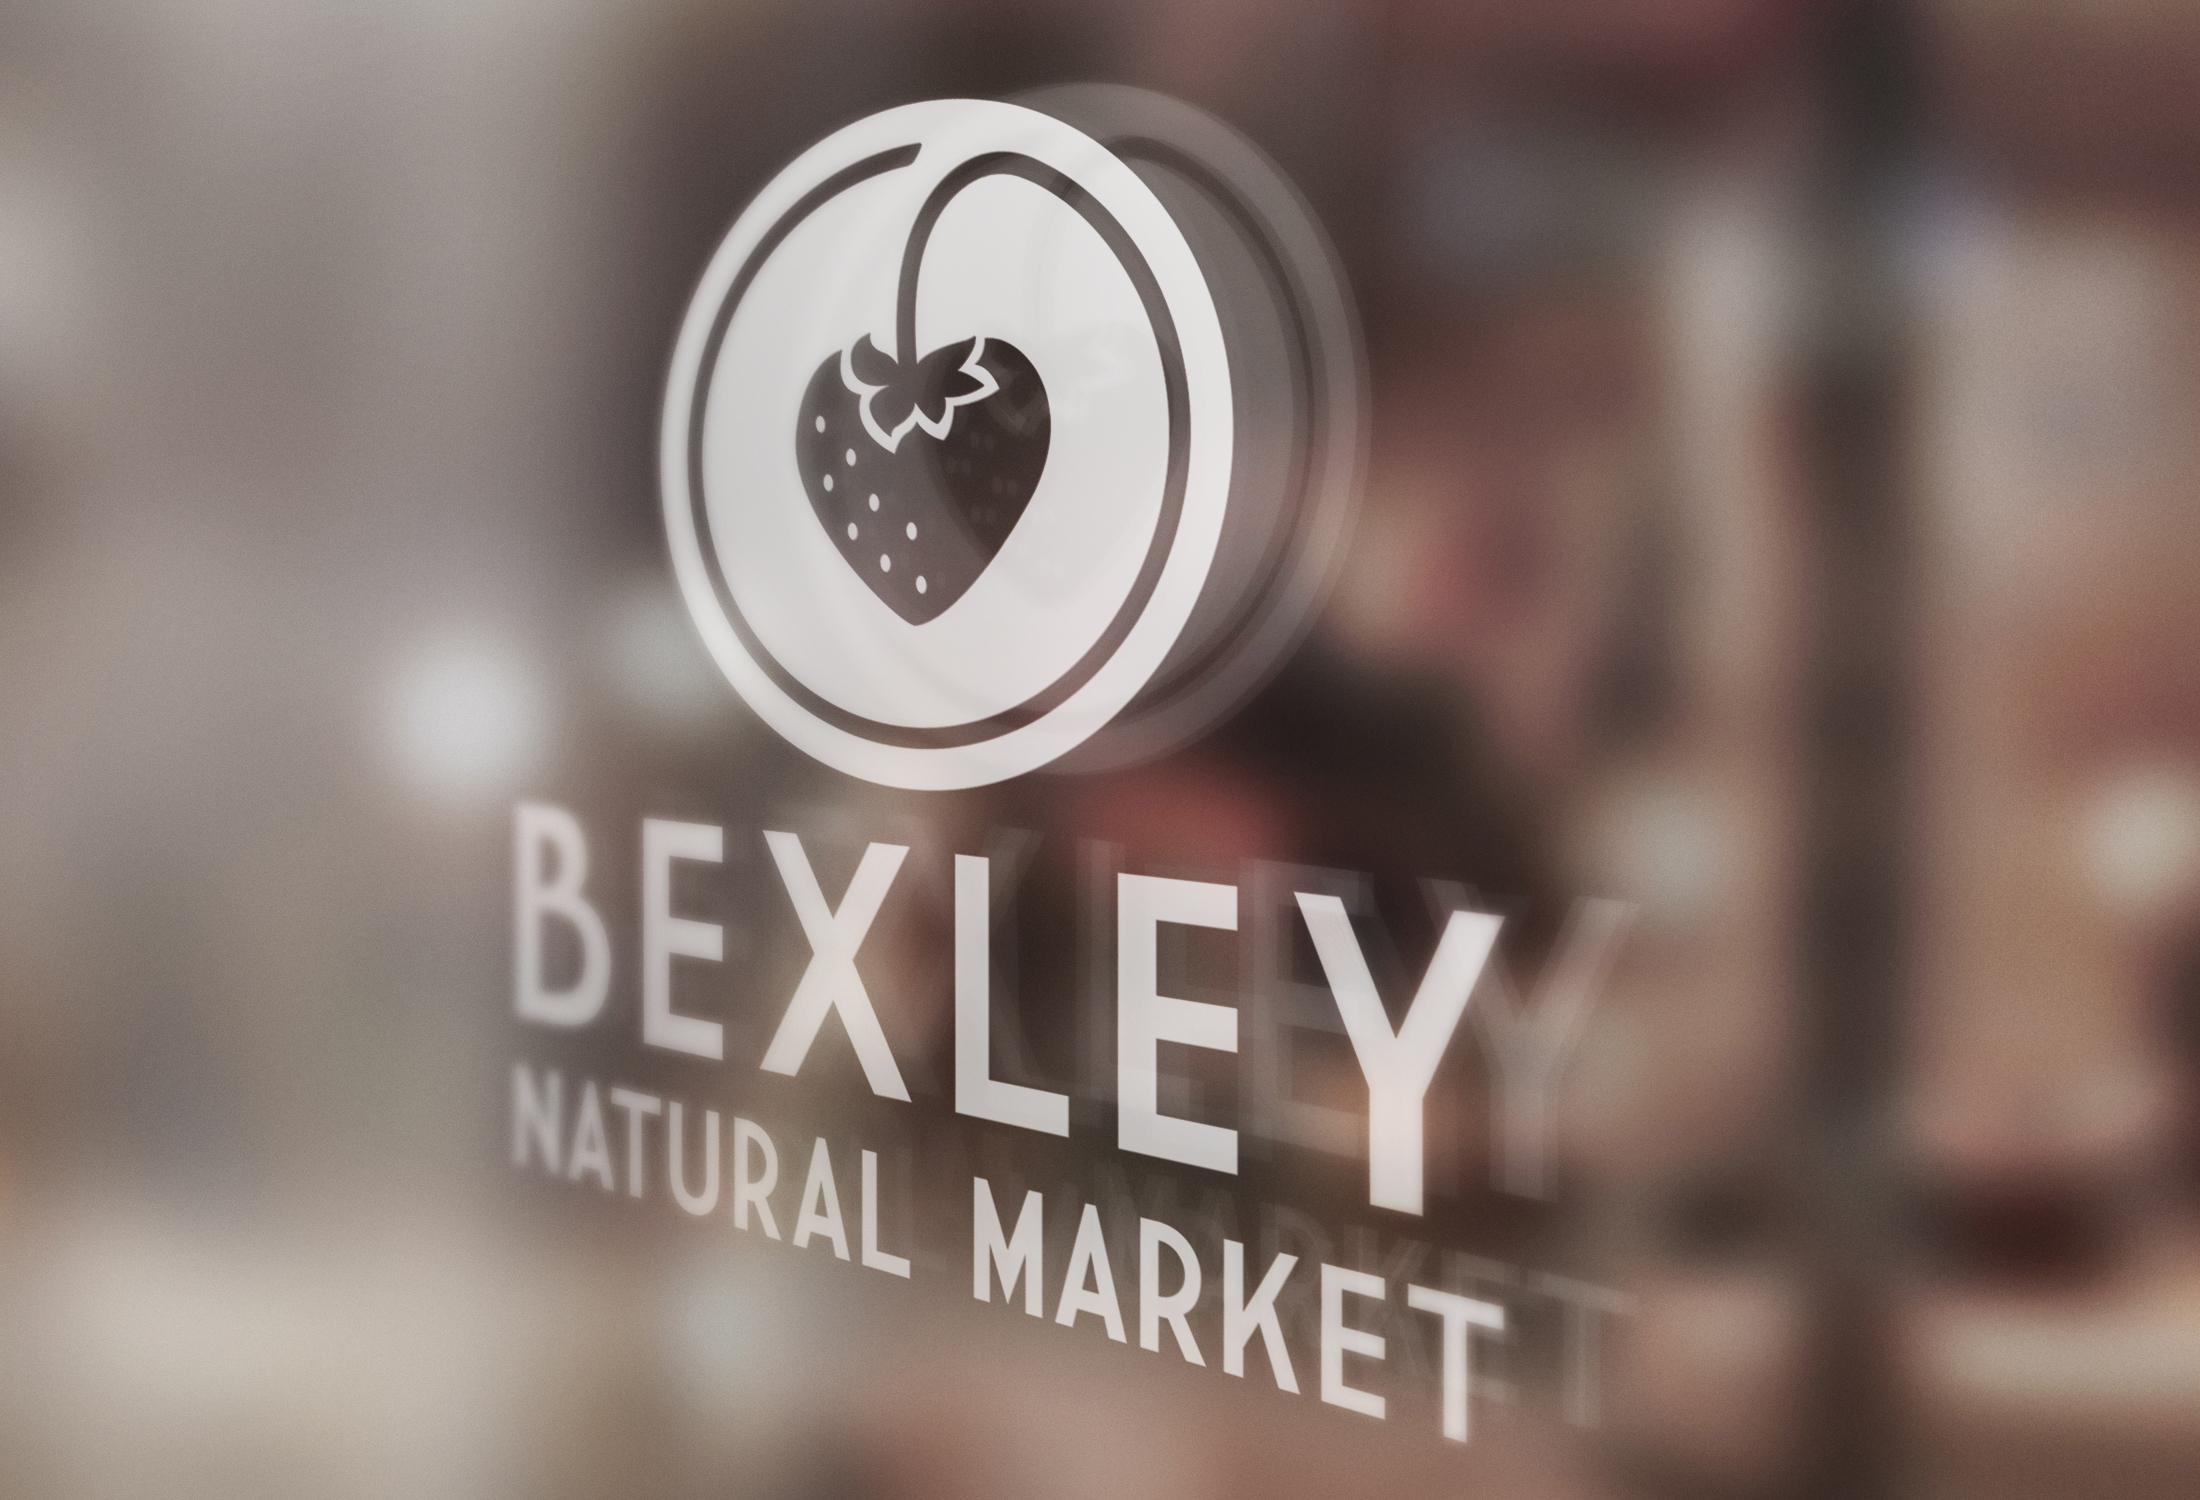 Bexley-signage